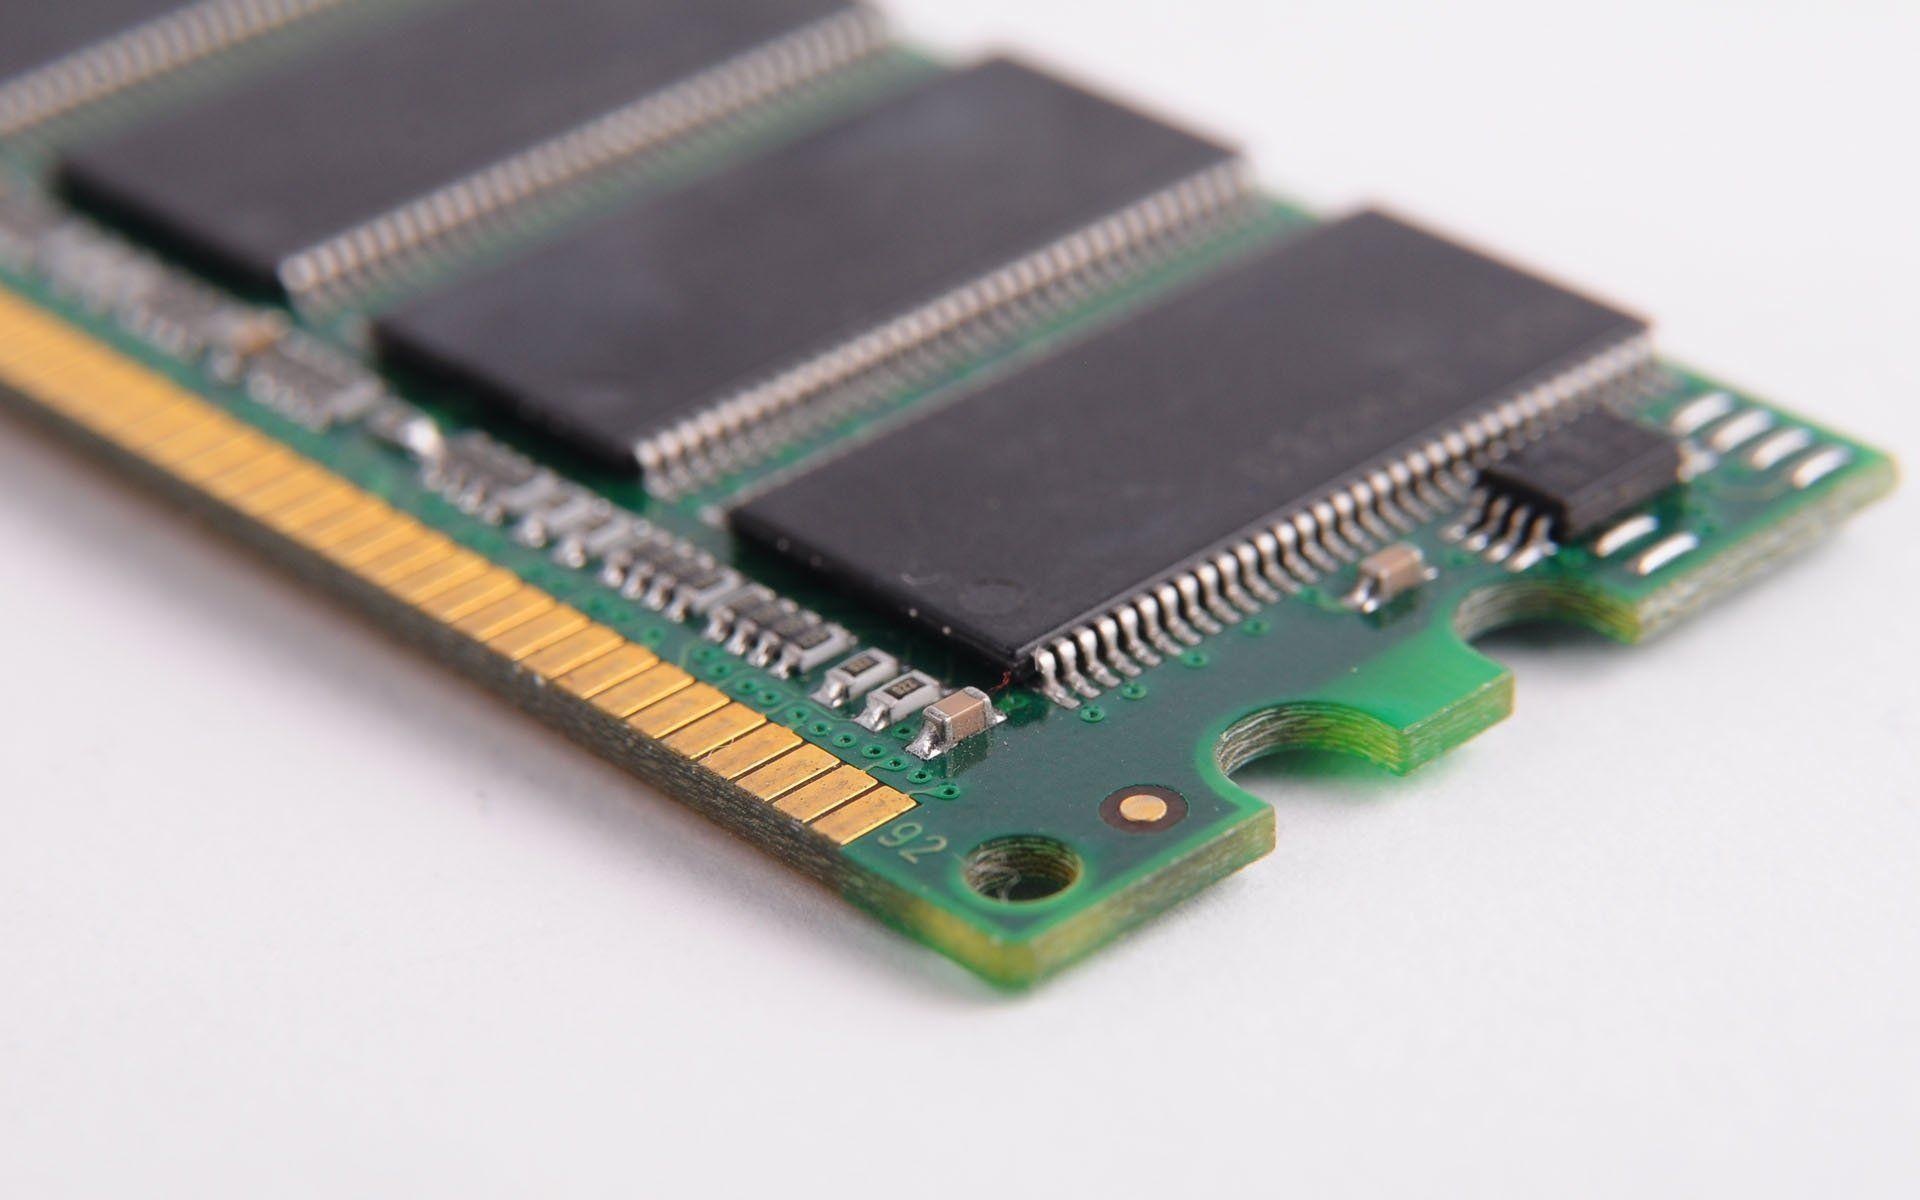 ICYMI: @bitcoinrts #btc #Altcoin_News #Bitcoin #Hardware #Mining ...